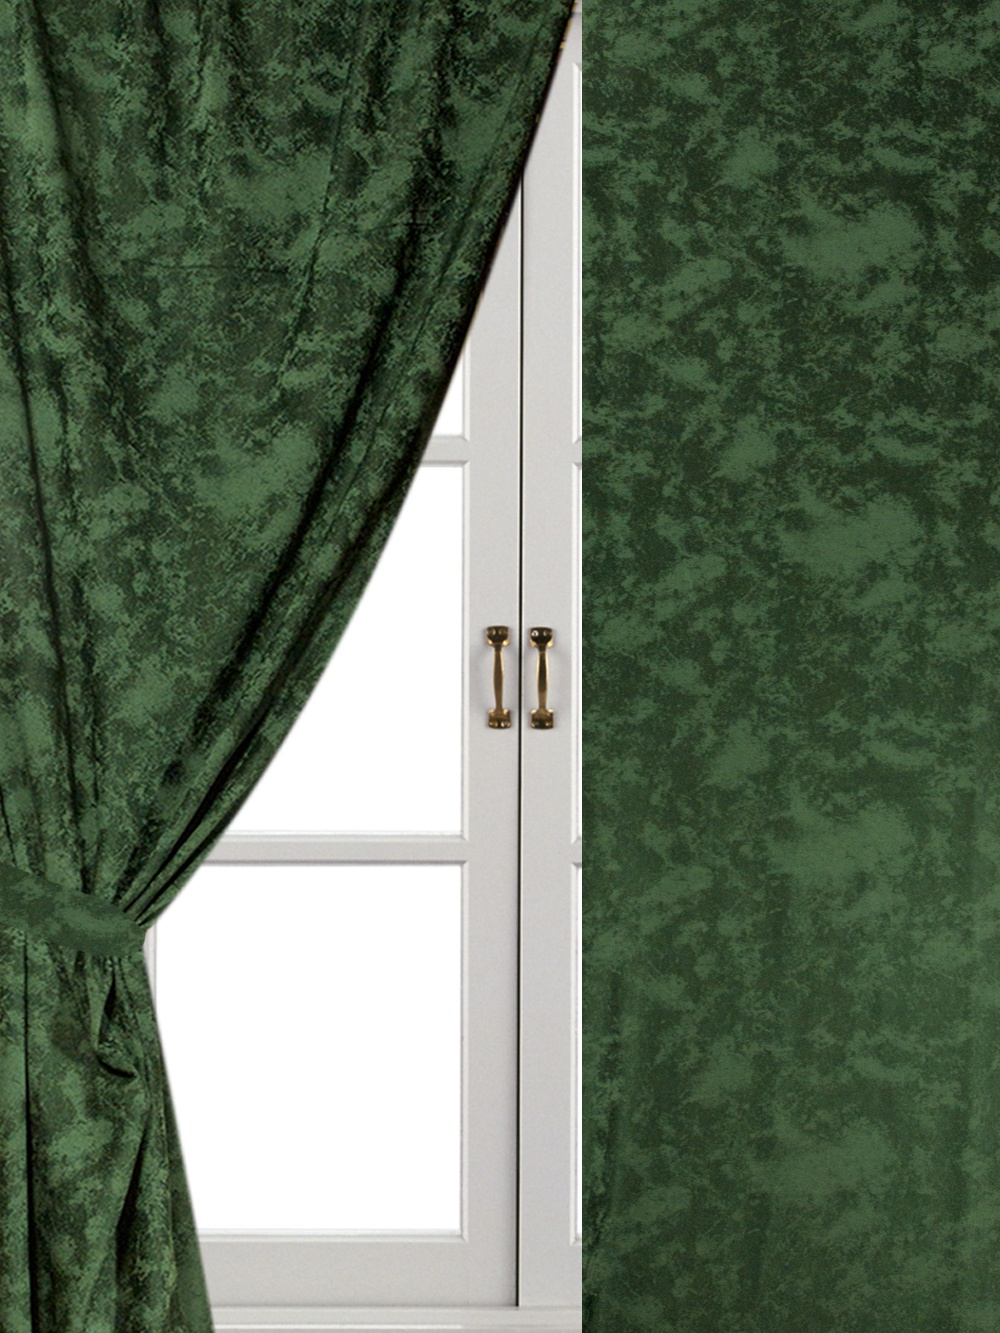 Шторы комнатные Айлант ОБ10 шторы homedeco нитяные шторы яркие кольца